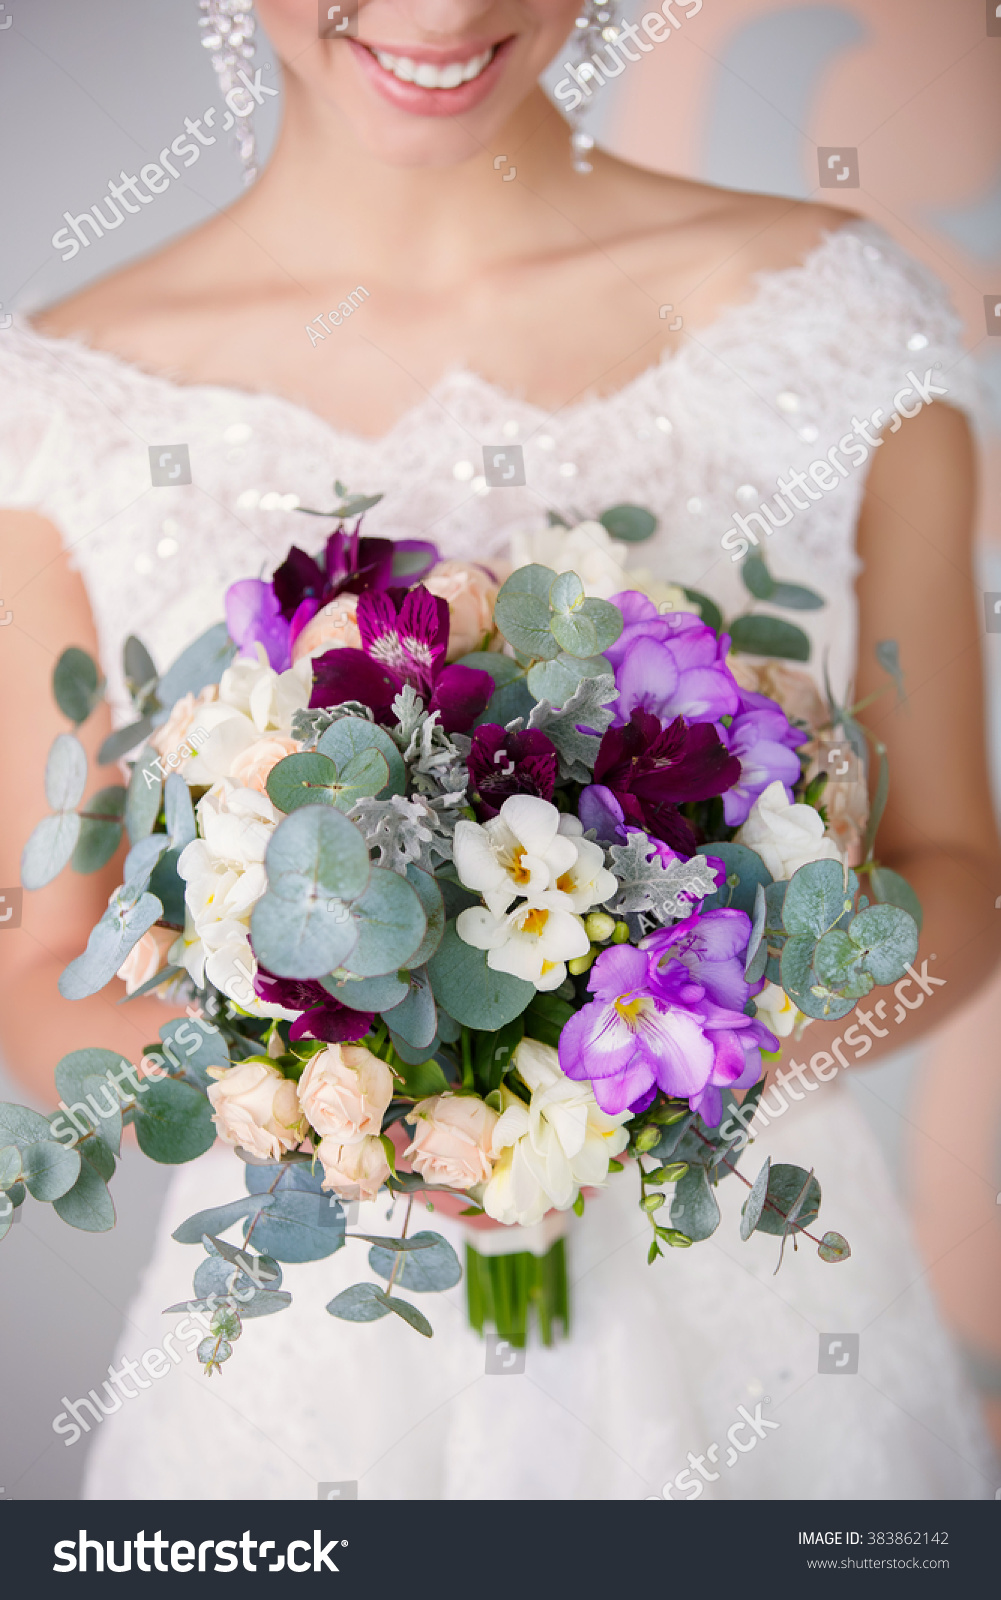 Bride Wedding Flowers Bouquet Bridal Flowers Stock Photo & Image ...